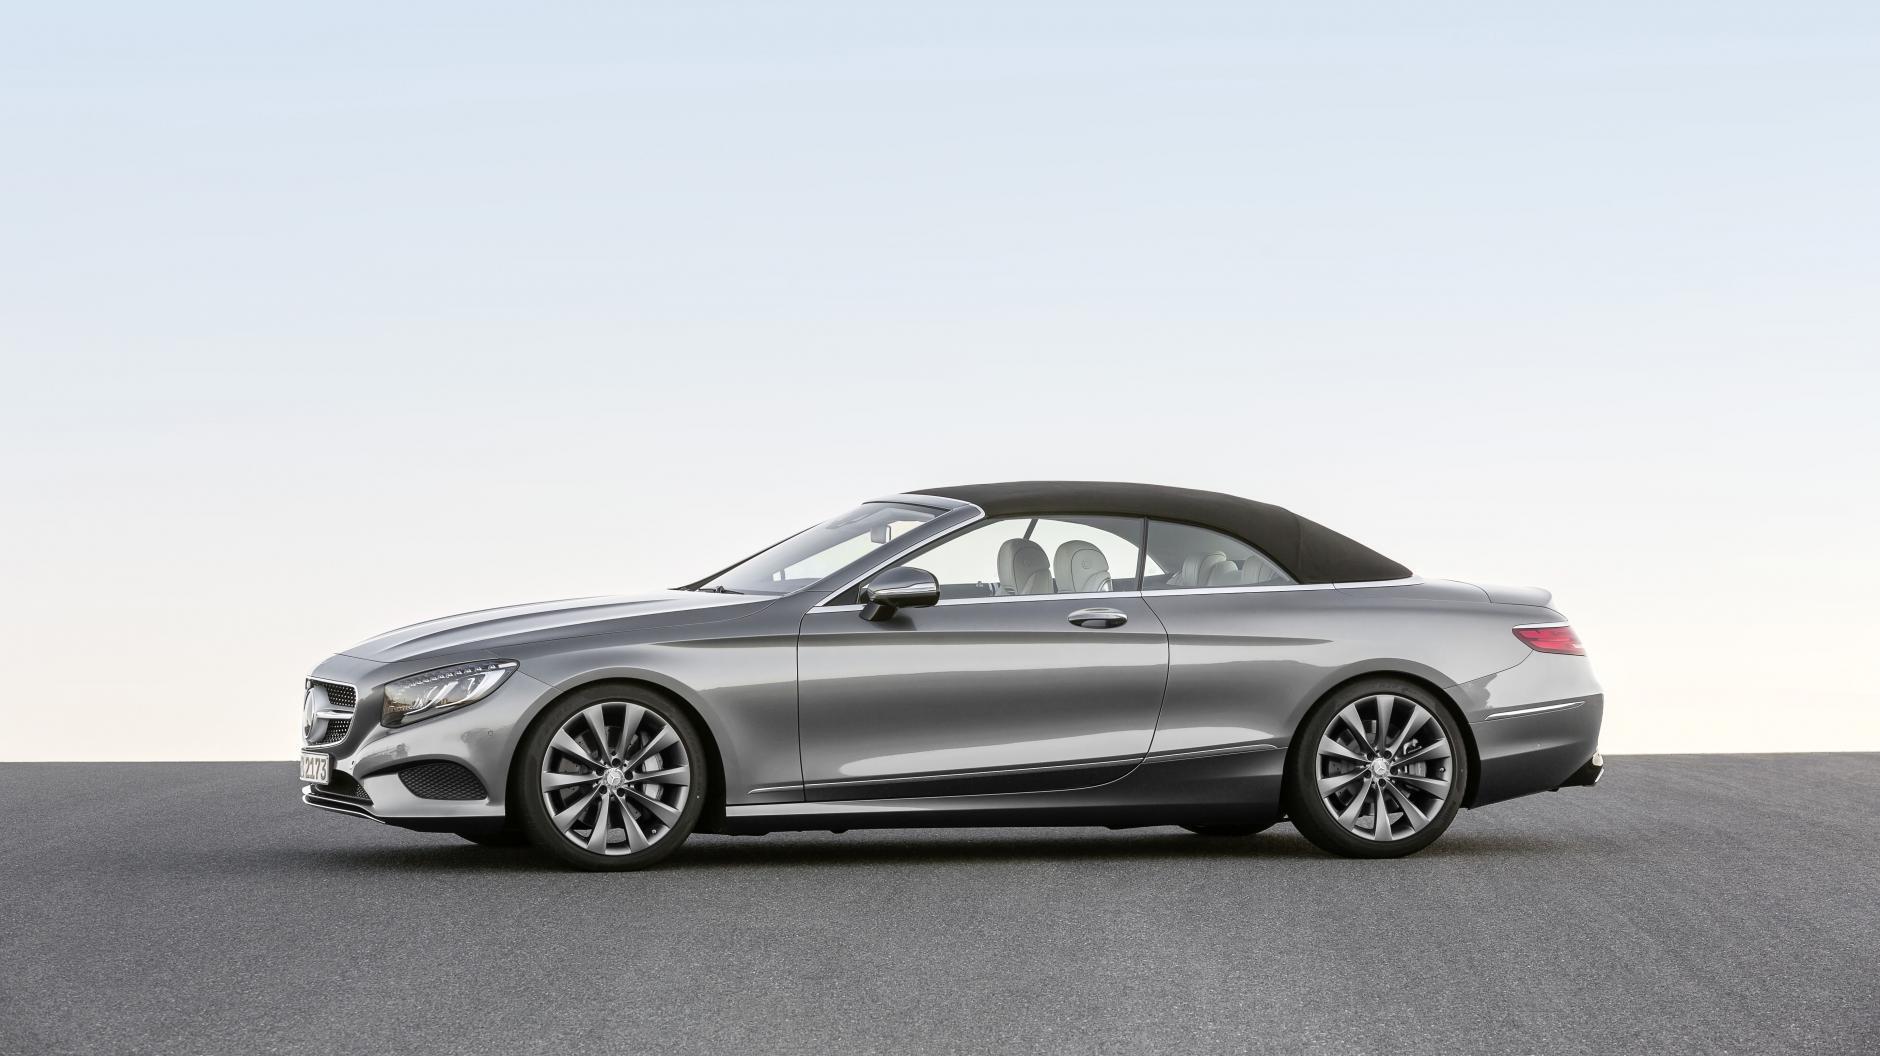 Pics: new Merc S-Class Convertible revealed